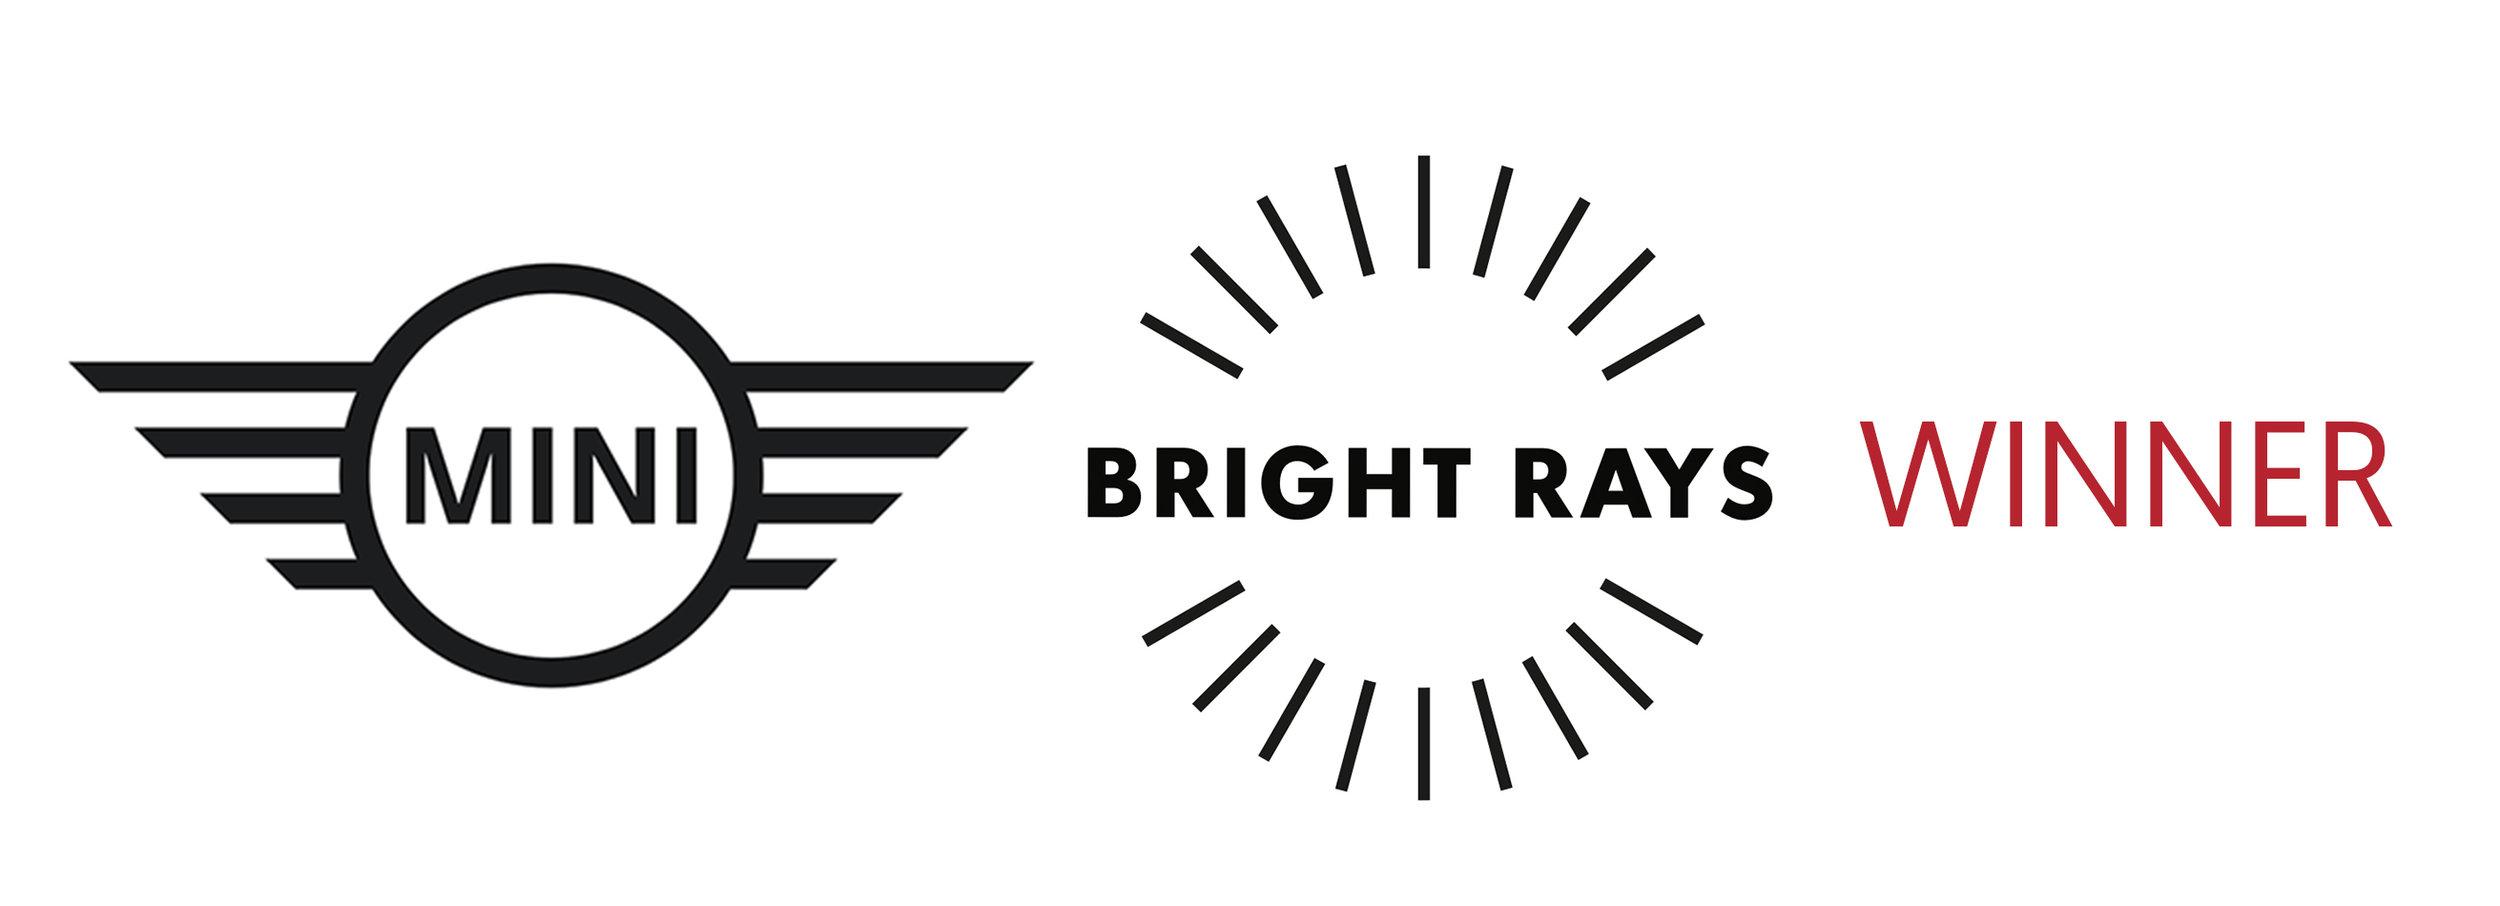 Red block mini bright rays.jpg